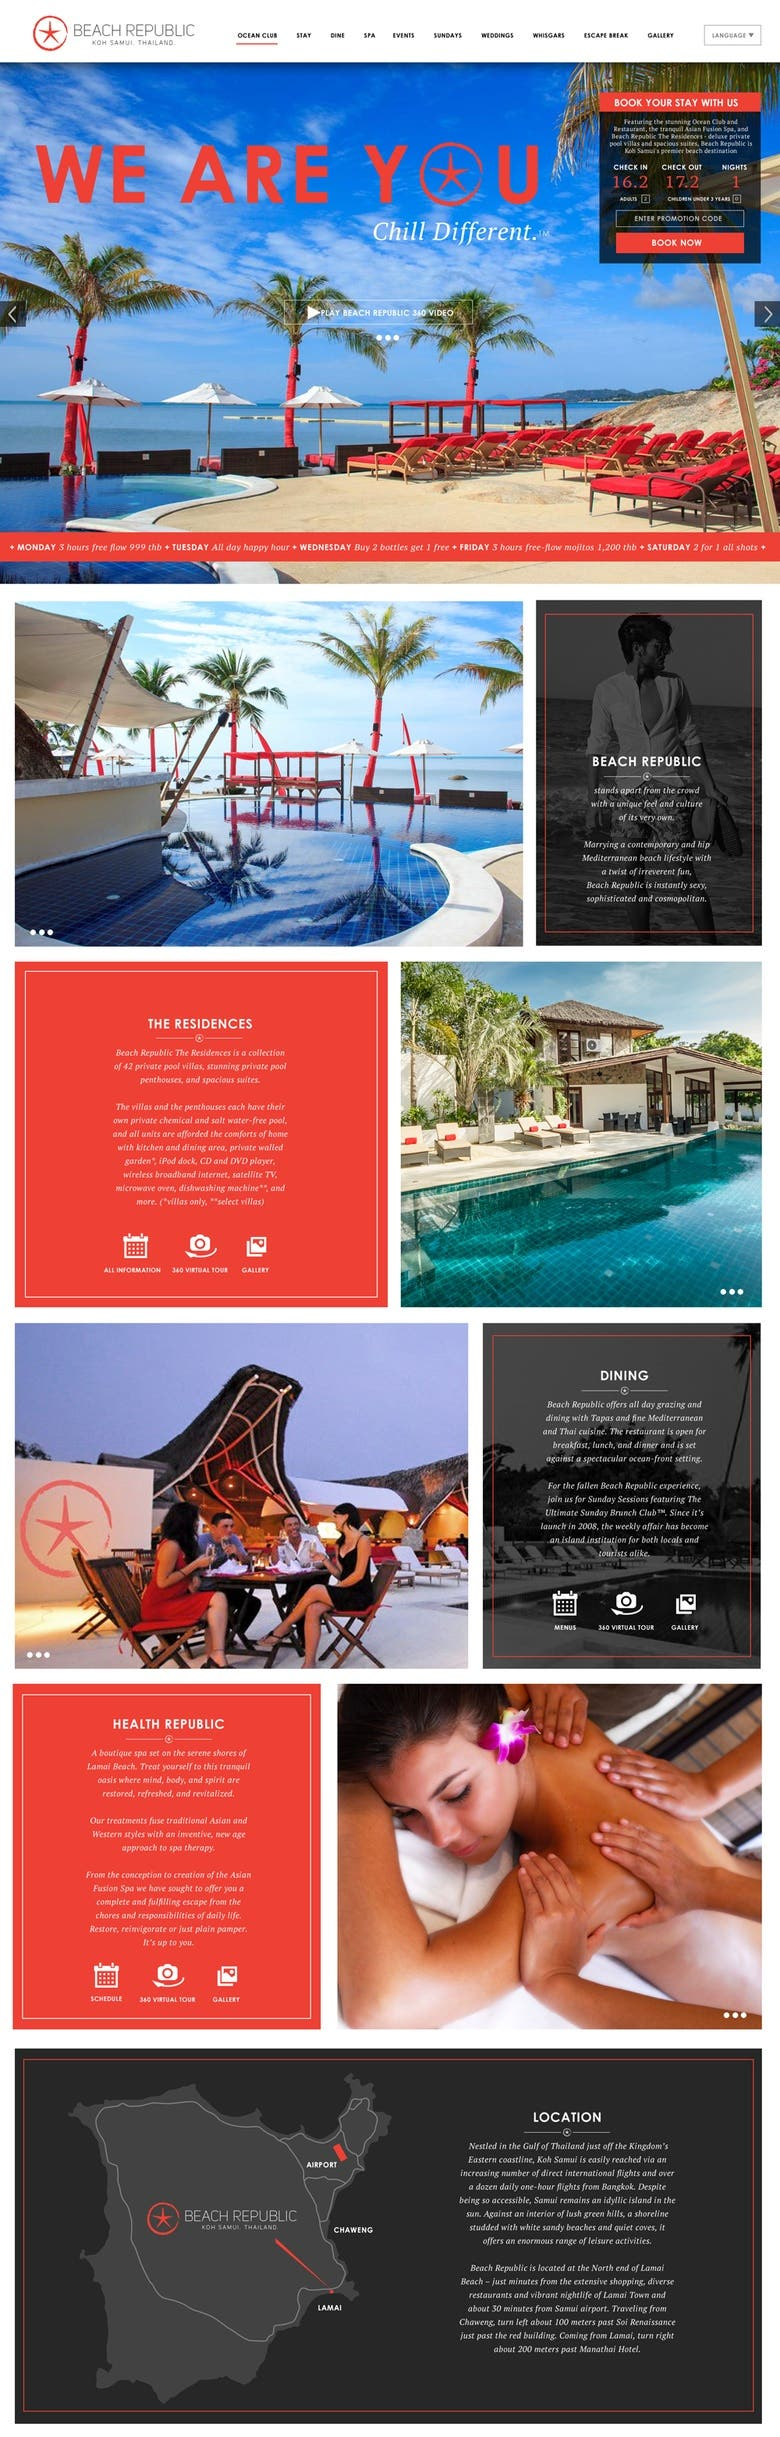 Web Layouts Beach Club Koh Samui Thailand Freelancer